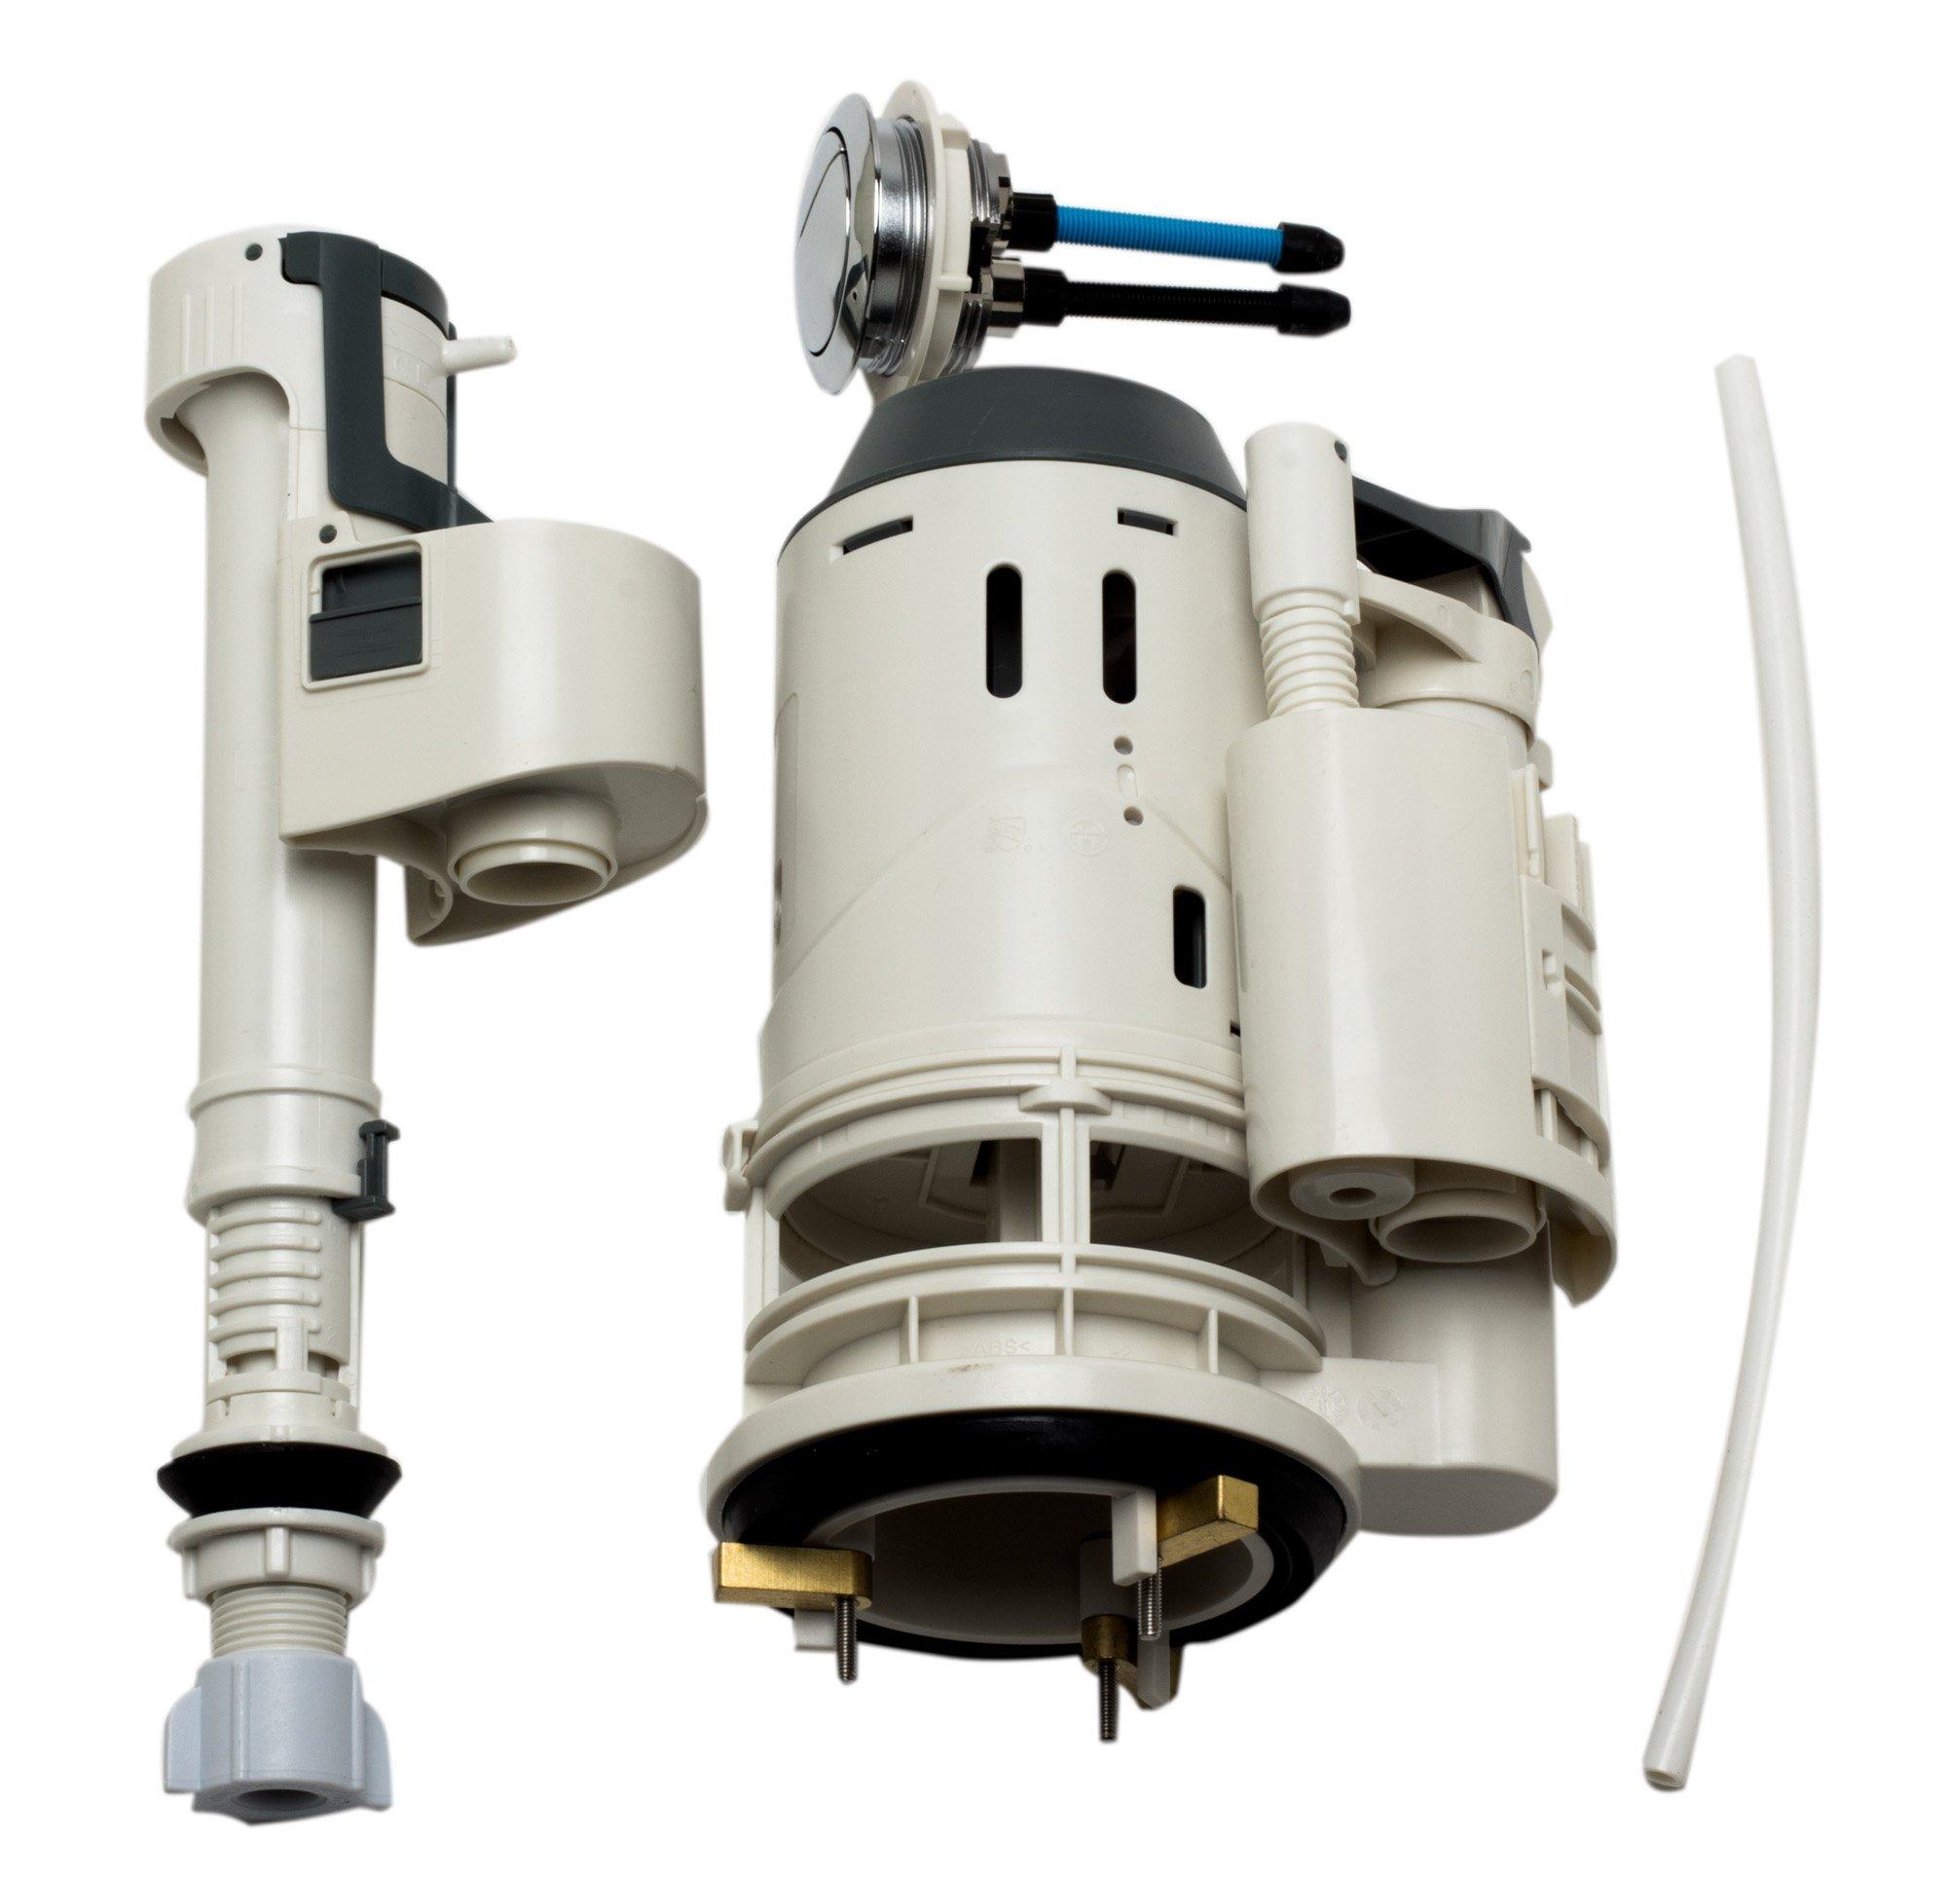 EAGO R-346FLUSH Replacement Toilet Flushing Mechanism for TB346 by EAGO